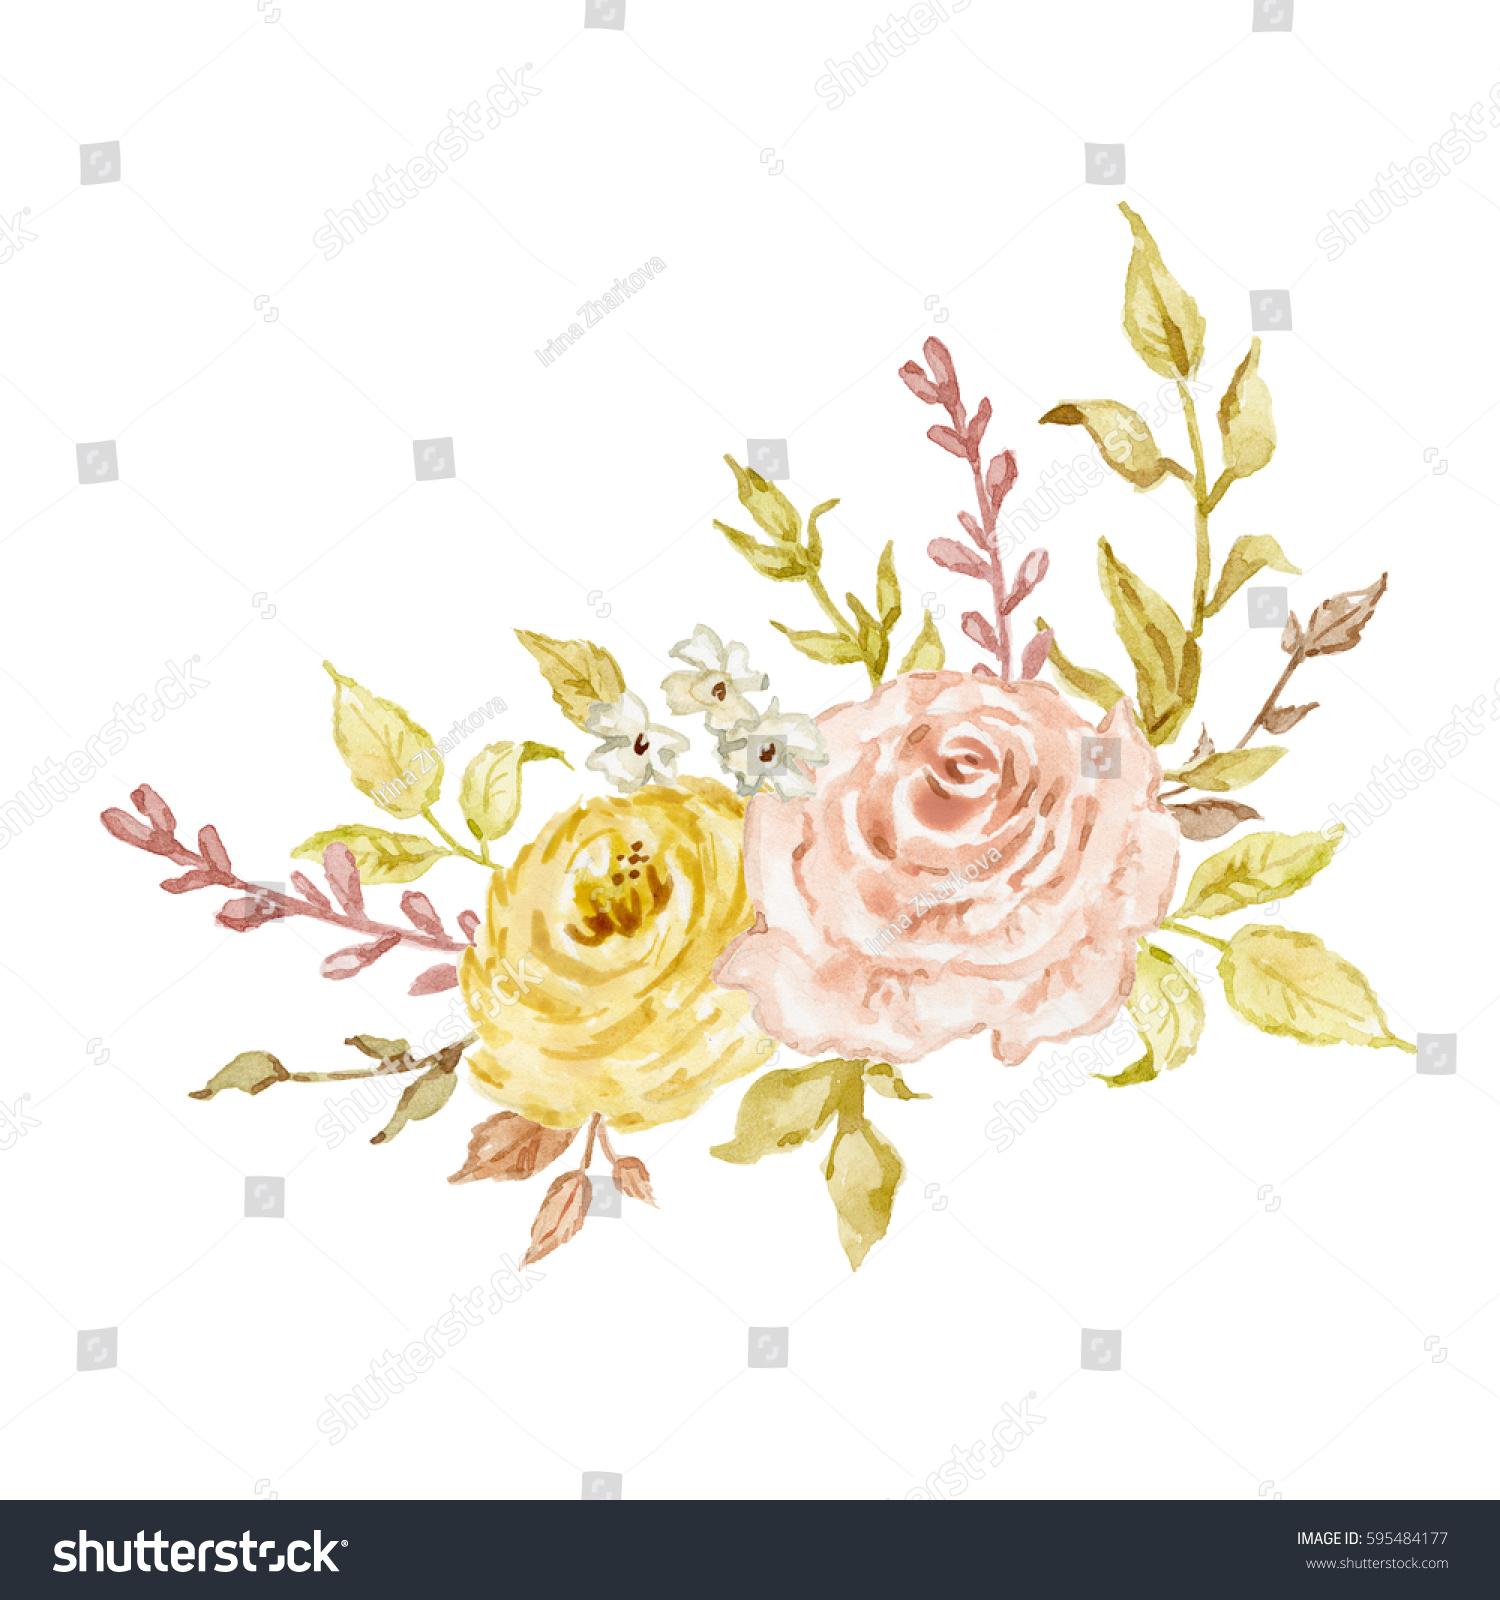 Painted Watercolor Composition Flowers Pastel Colors Stock ...